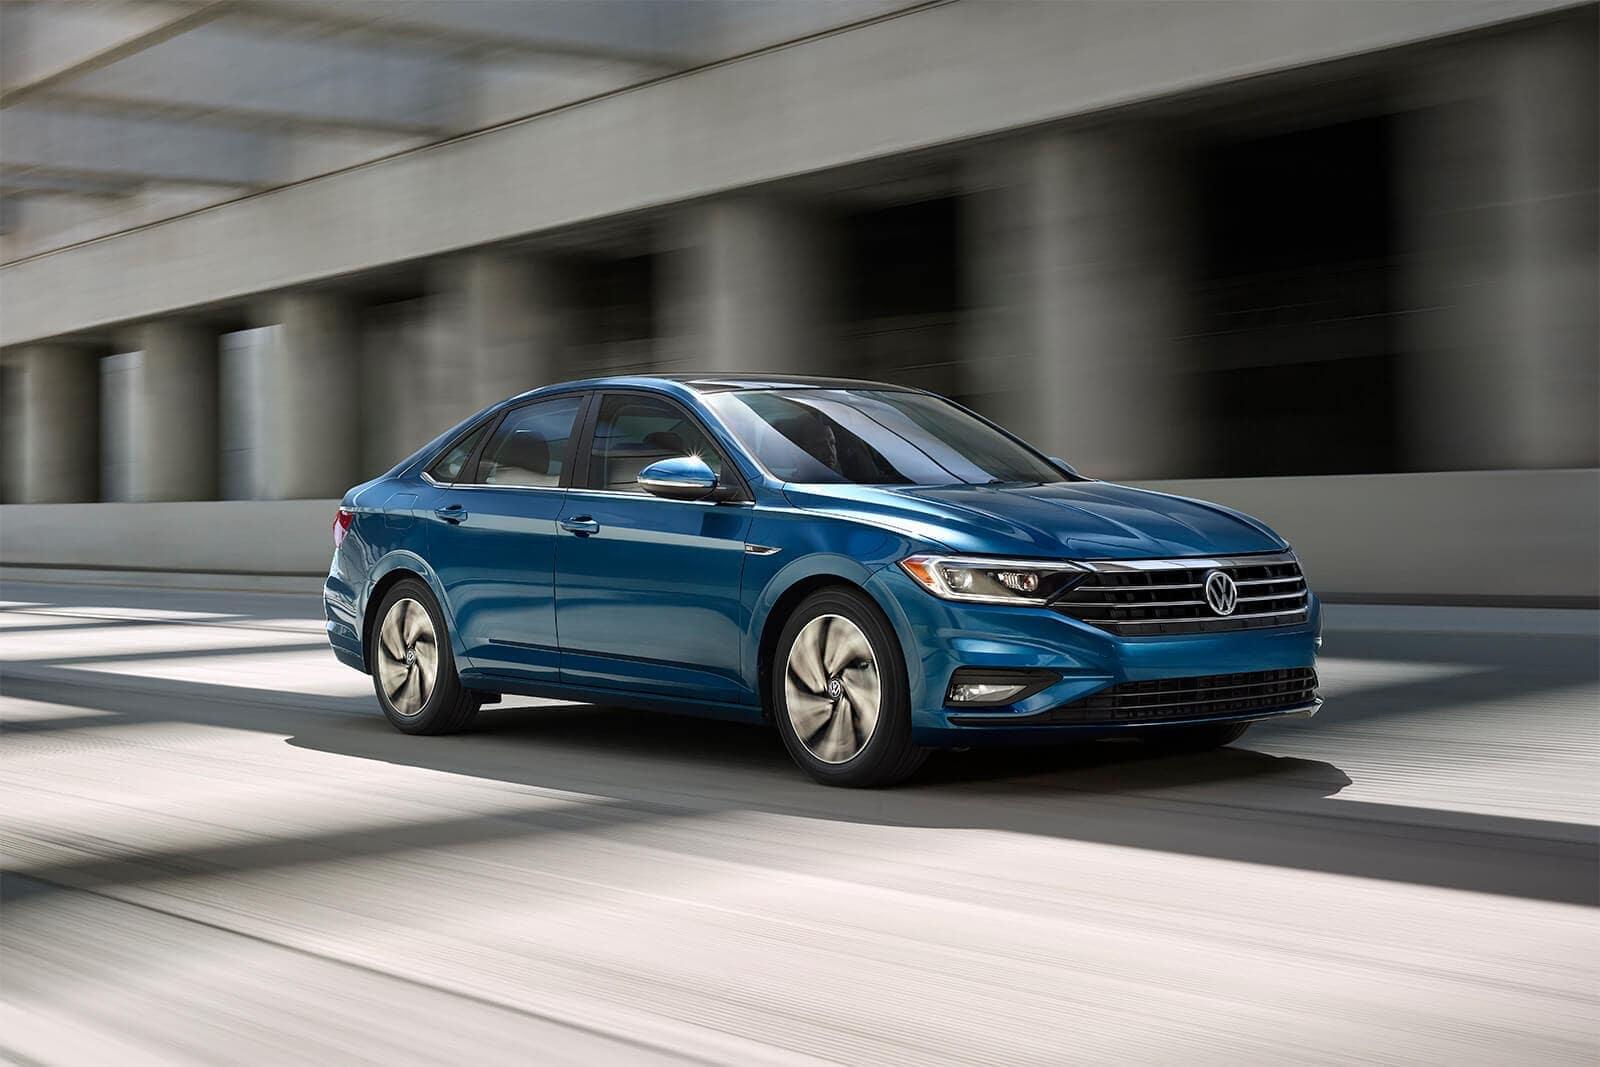 2019 Volkswagen Jetta in blue metallic driving down street